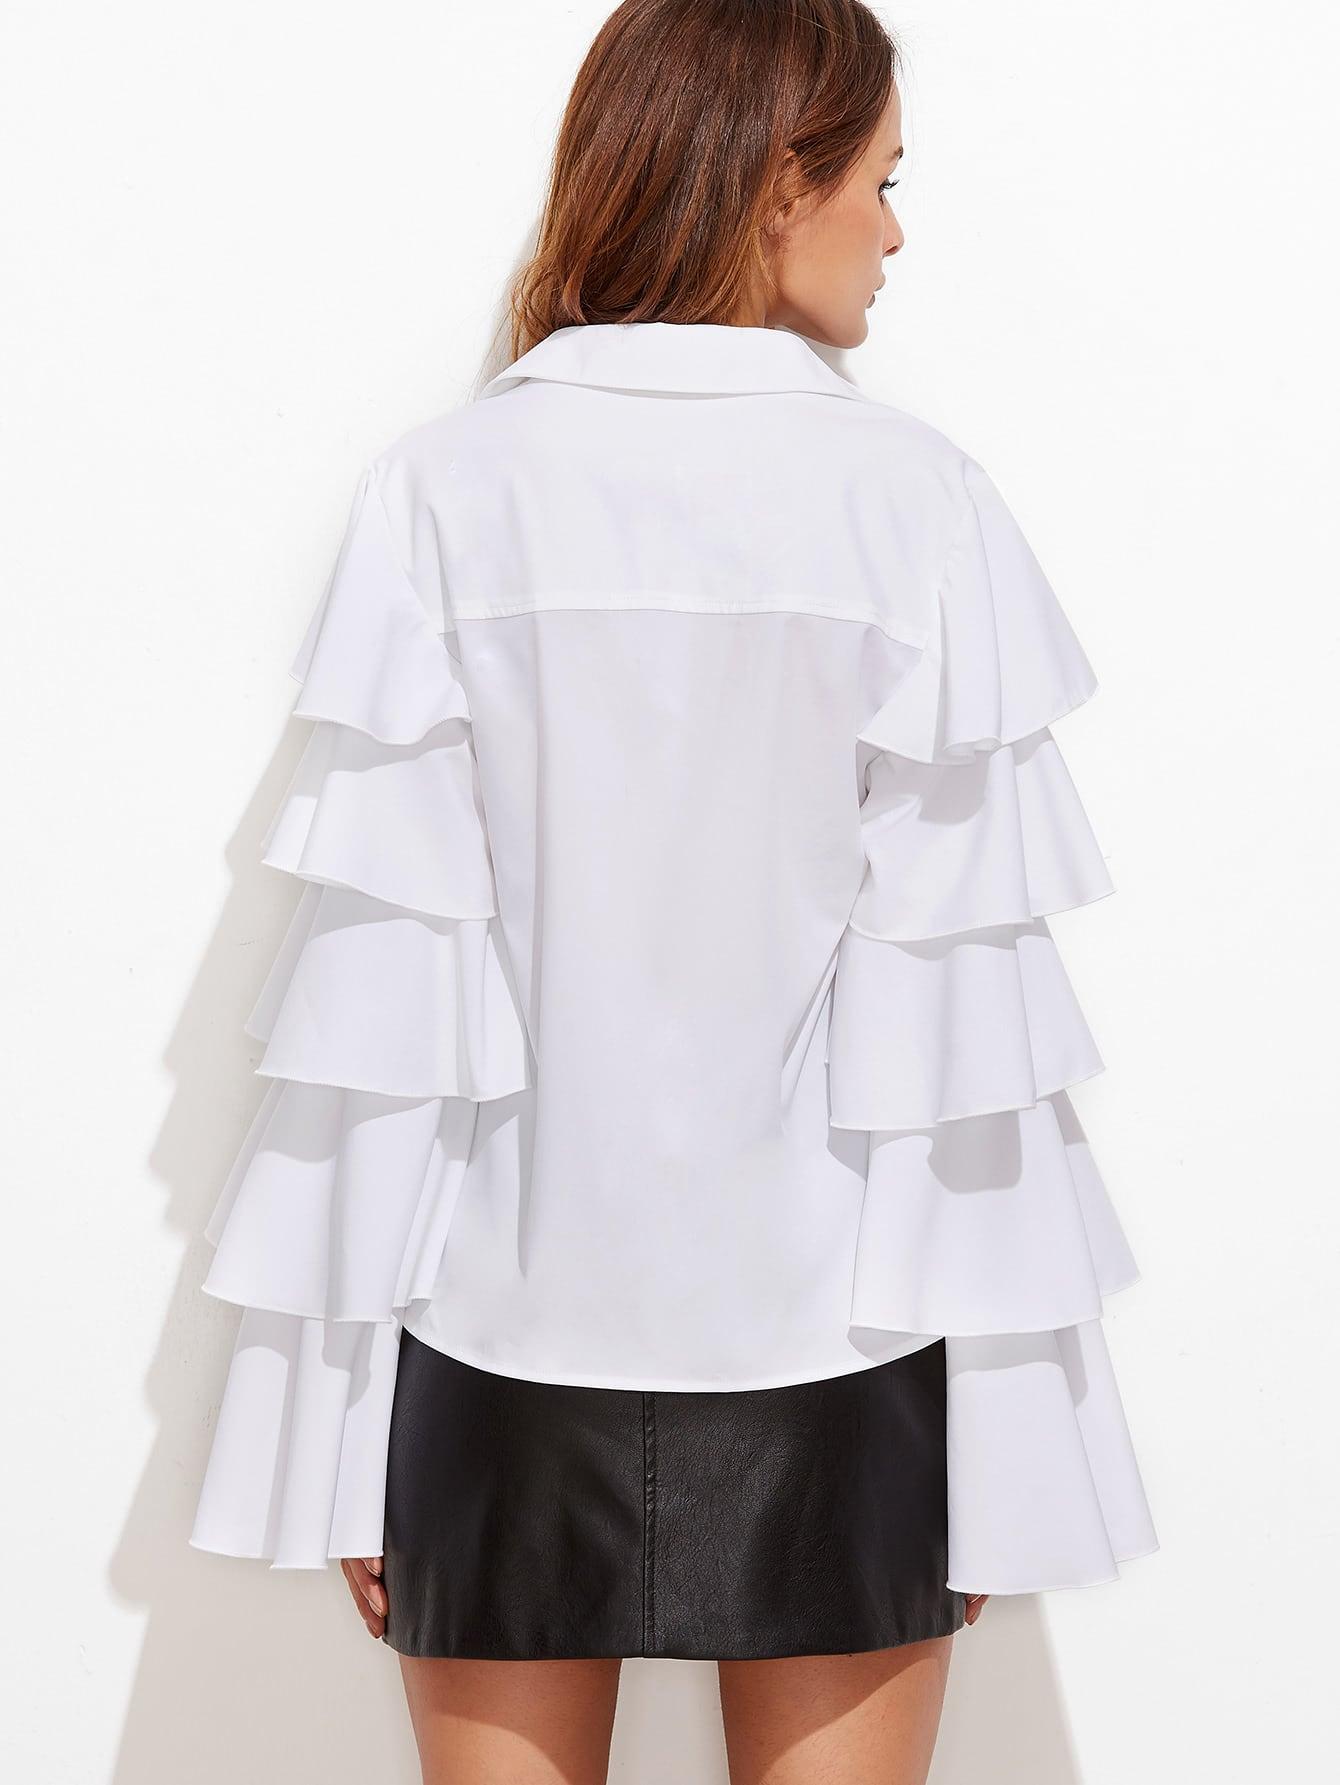 blouse161205715_2